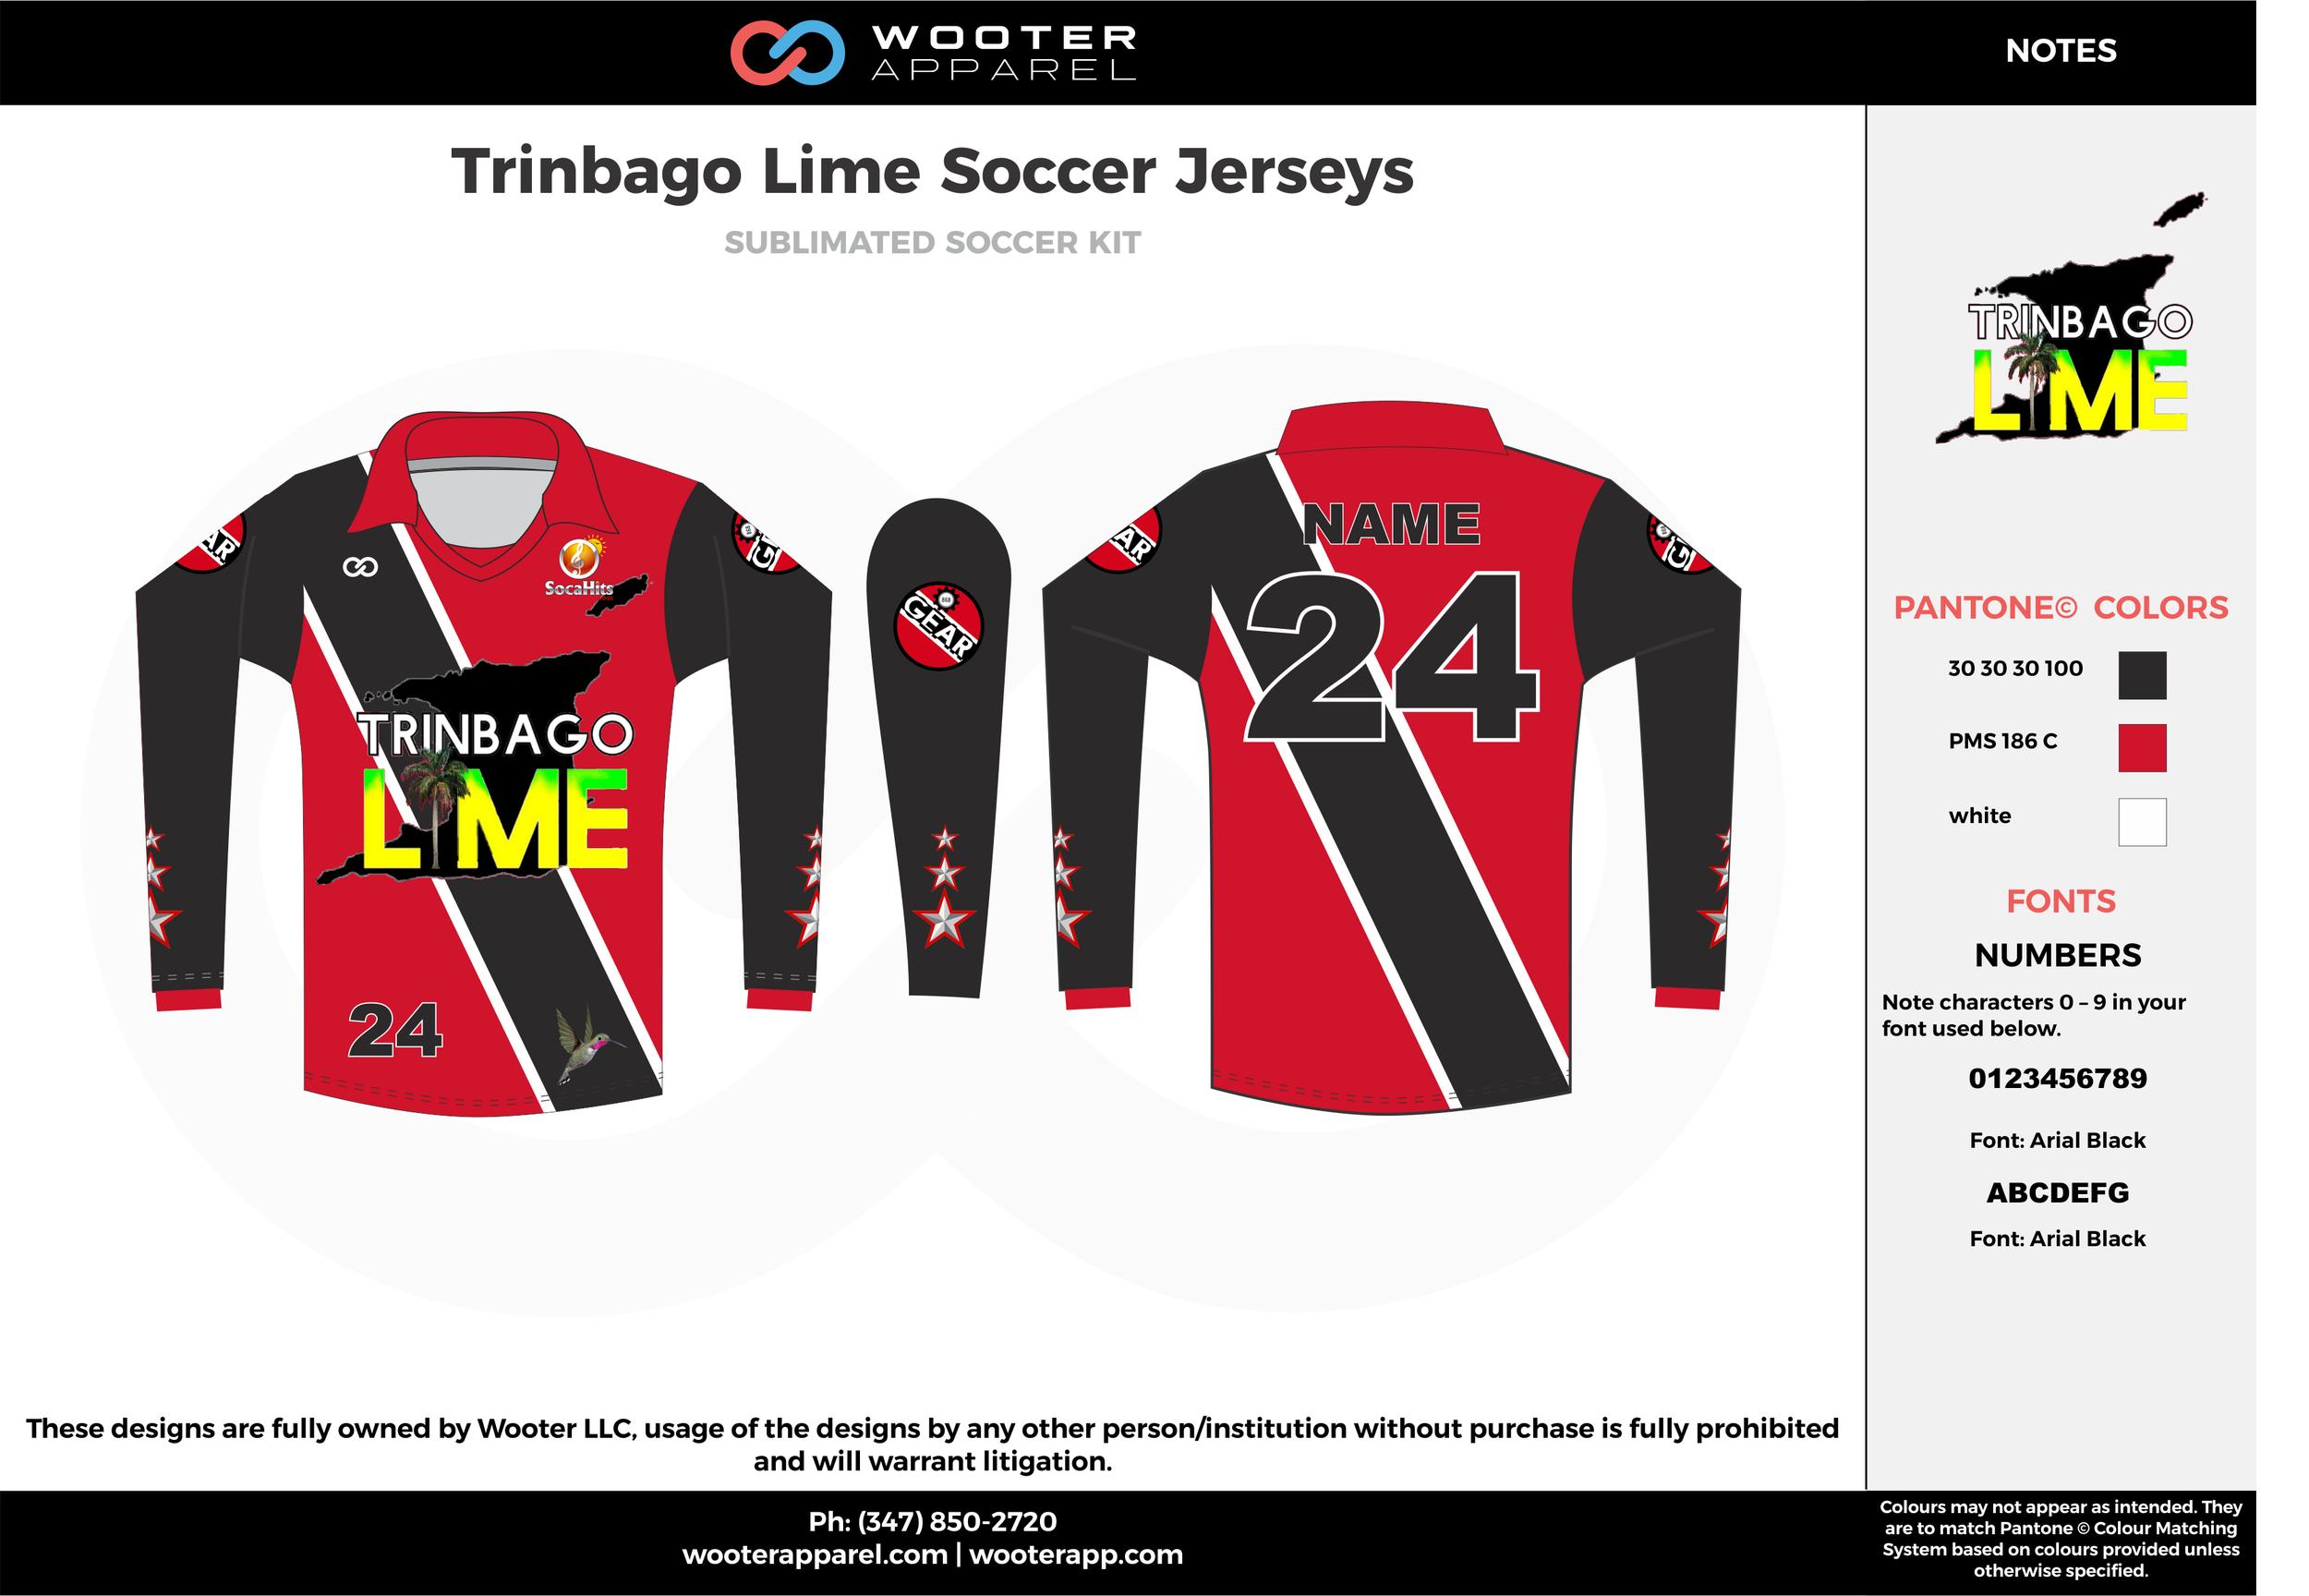 Trinbago lime black red custom sublimated soccer uniform jersey shirt